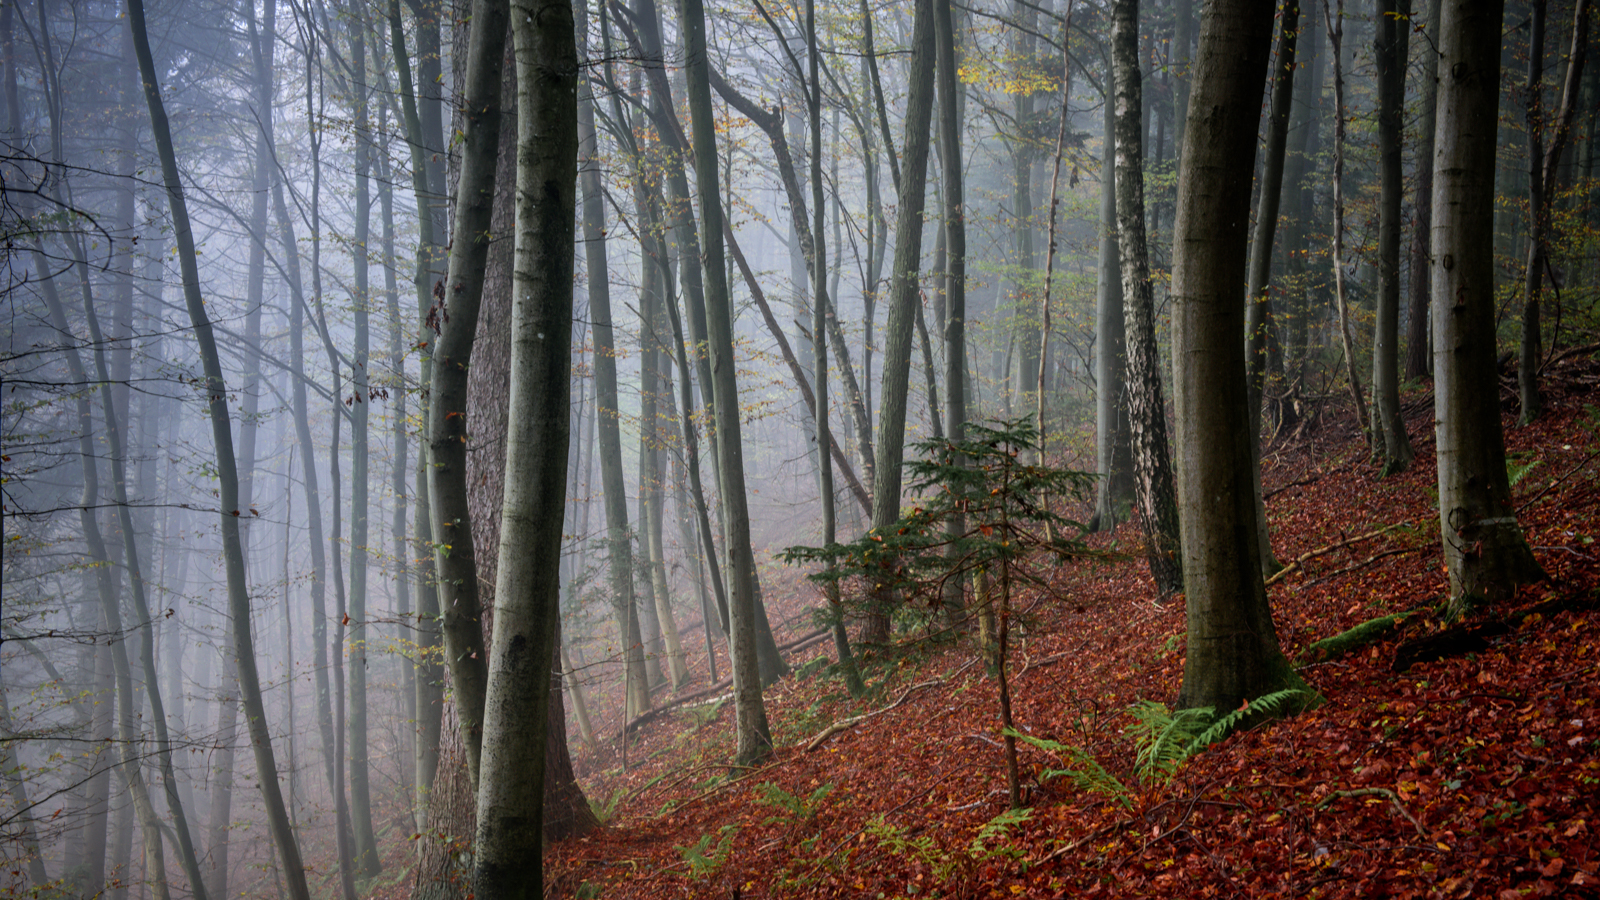 Zsofia_Daniel_Trees.jpg